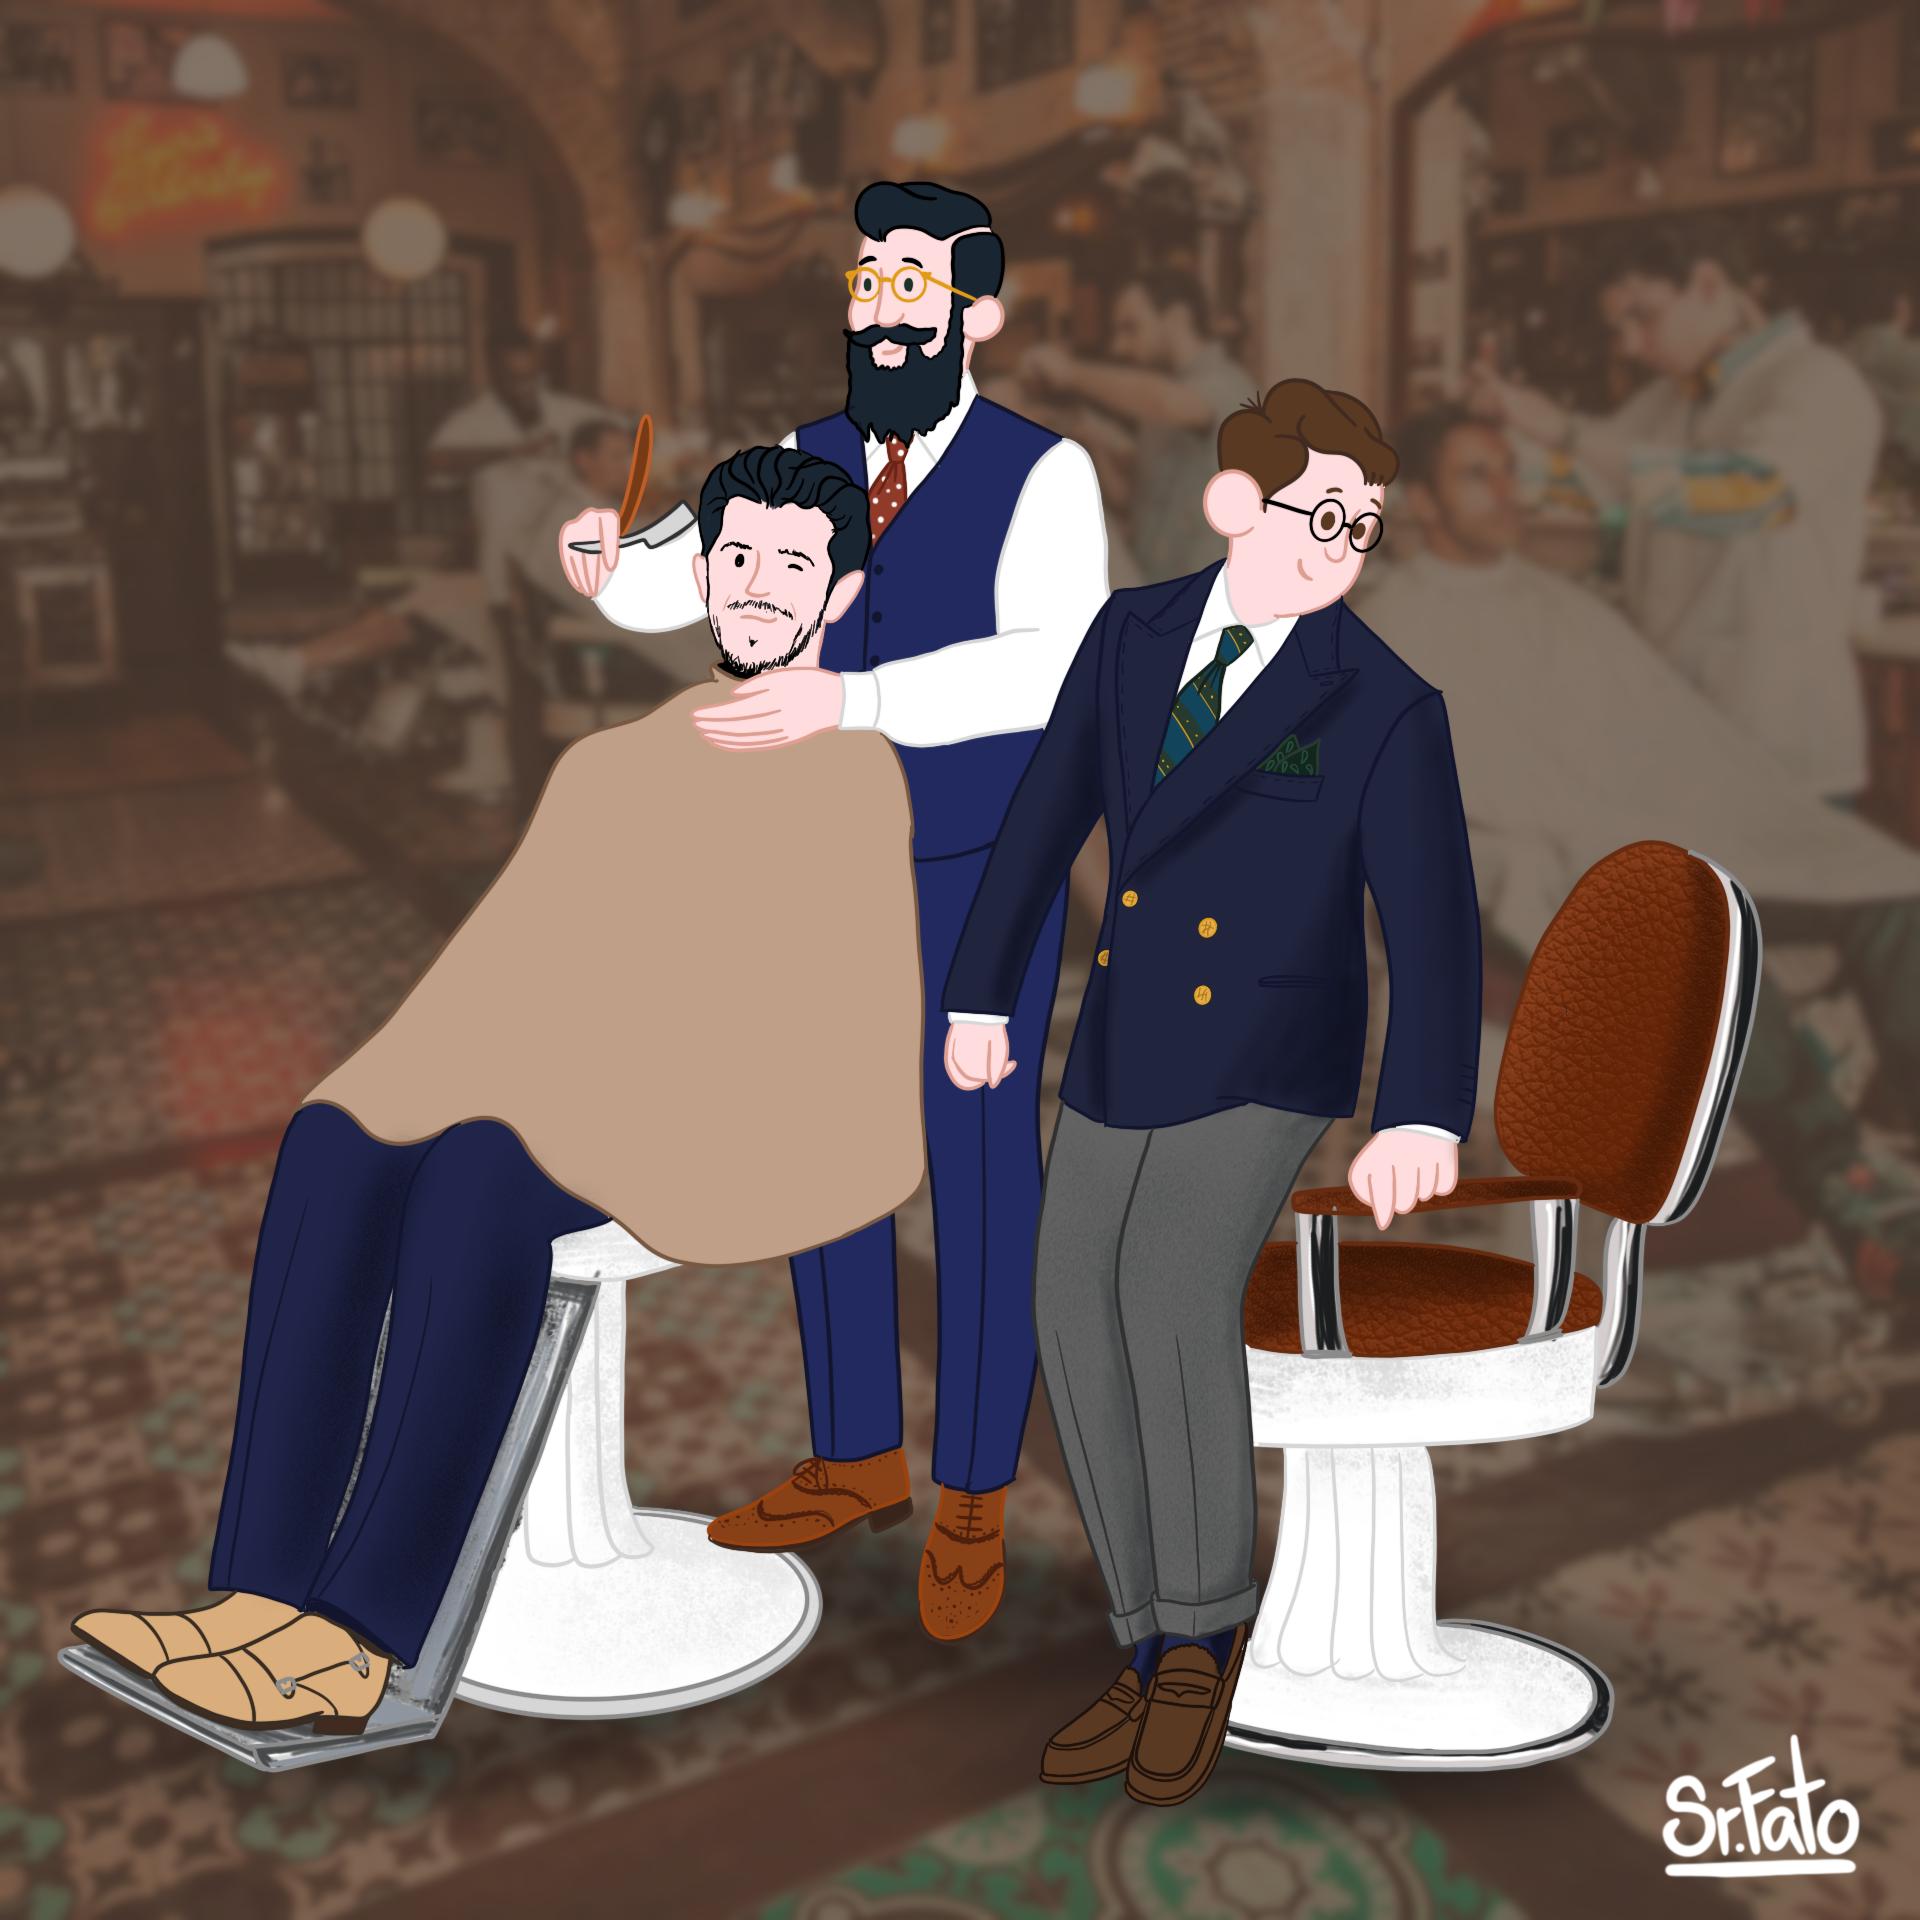 Sr. Fato - barbeiro